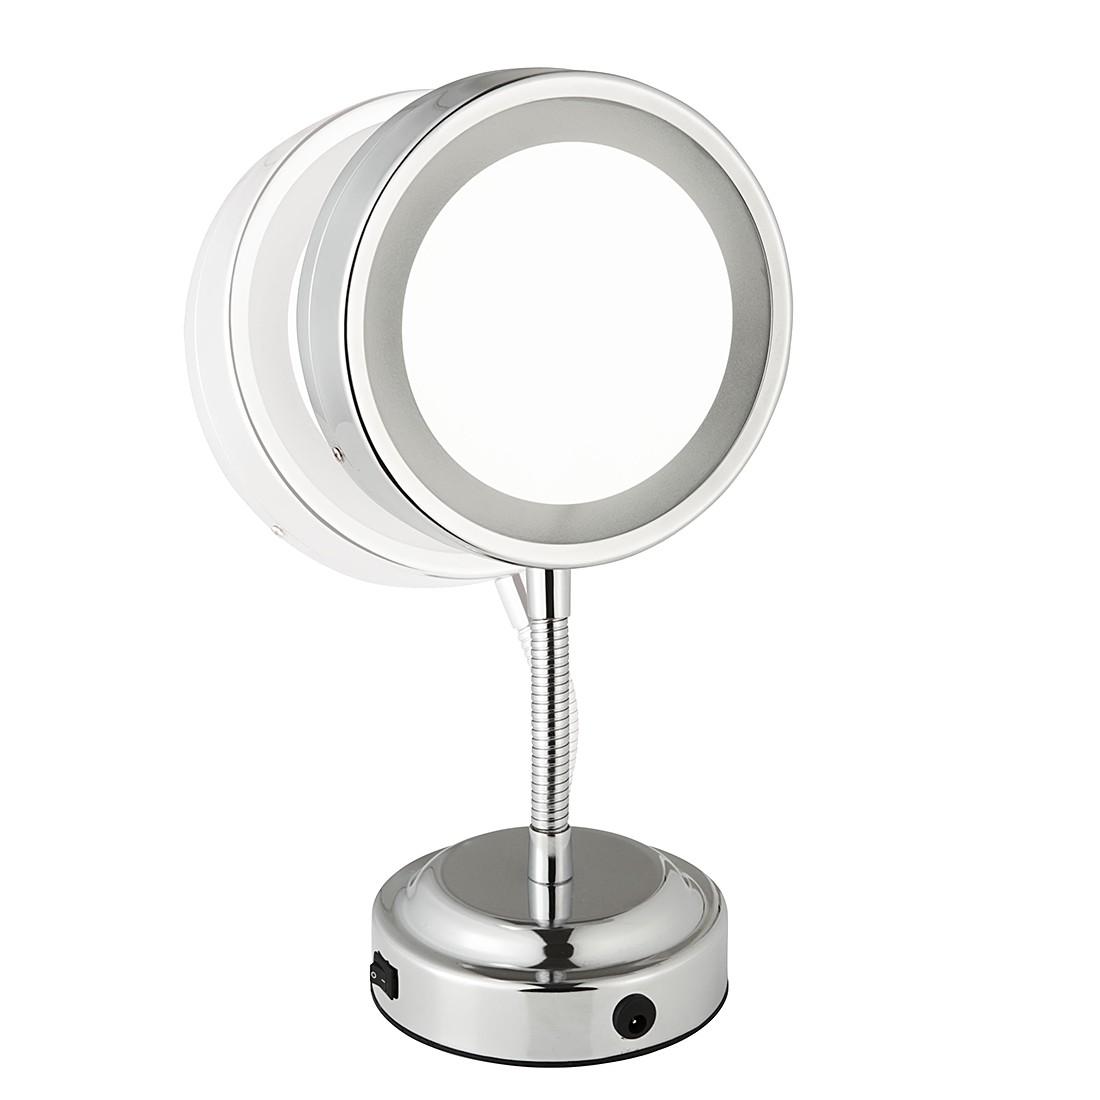 Standspiegel Katharina – Chrom, LED-Beleuchtung, 5-fache Vergrößerung, Sanwood bestellen